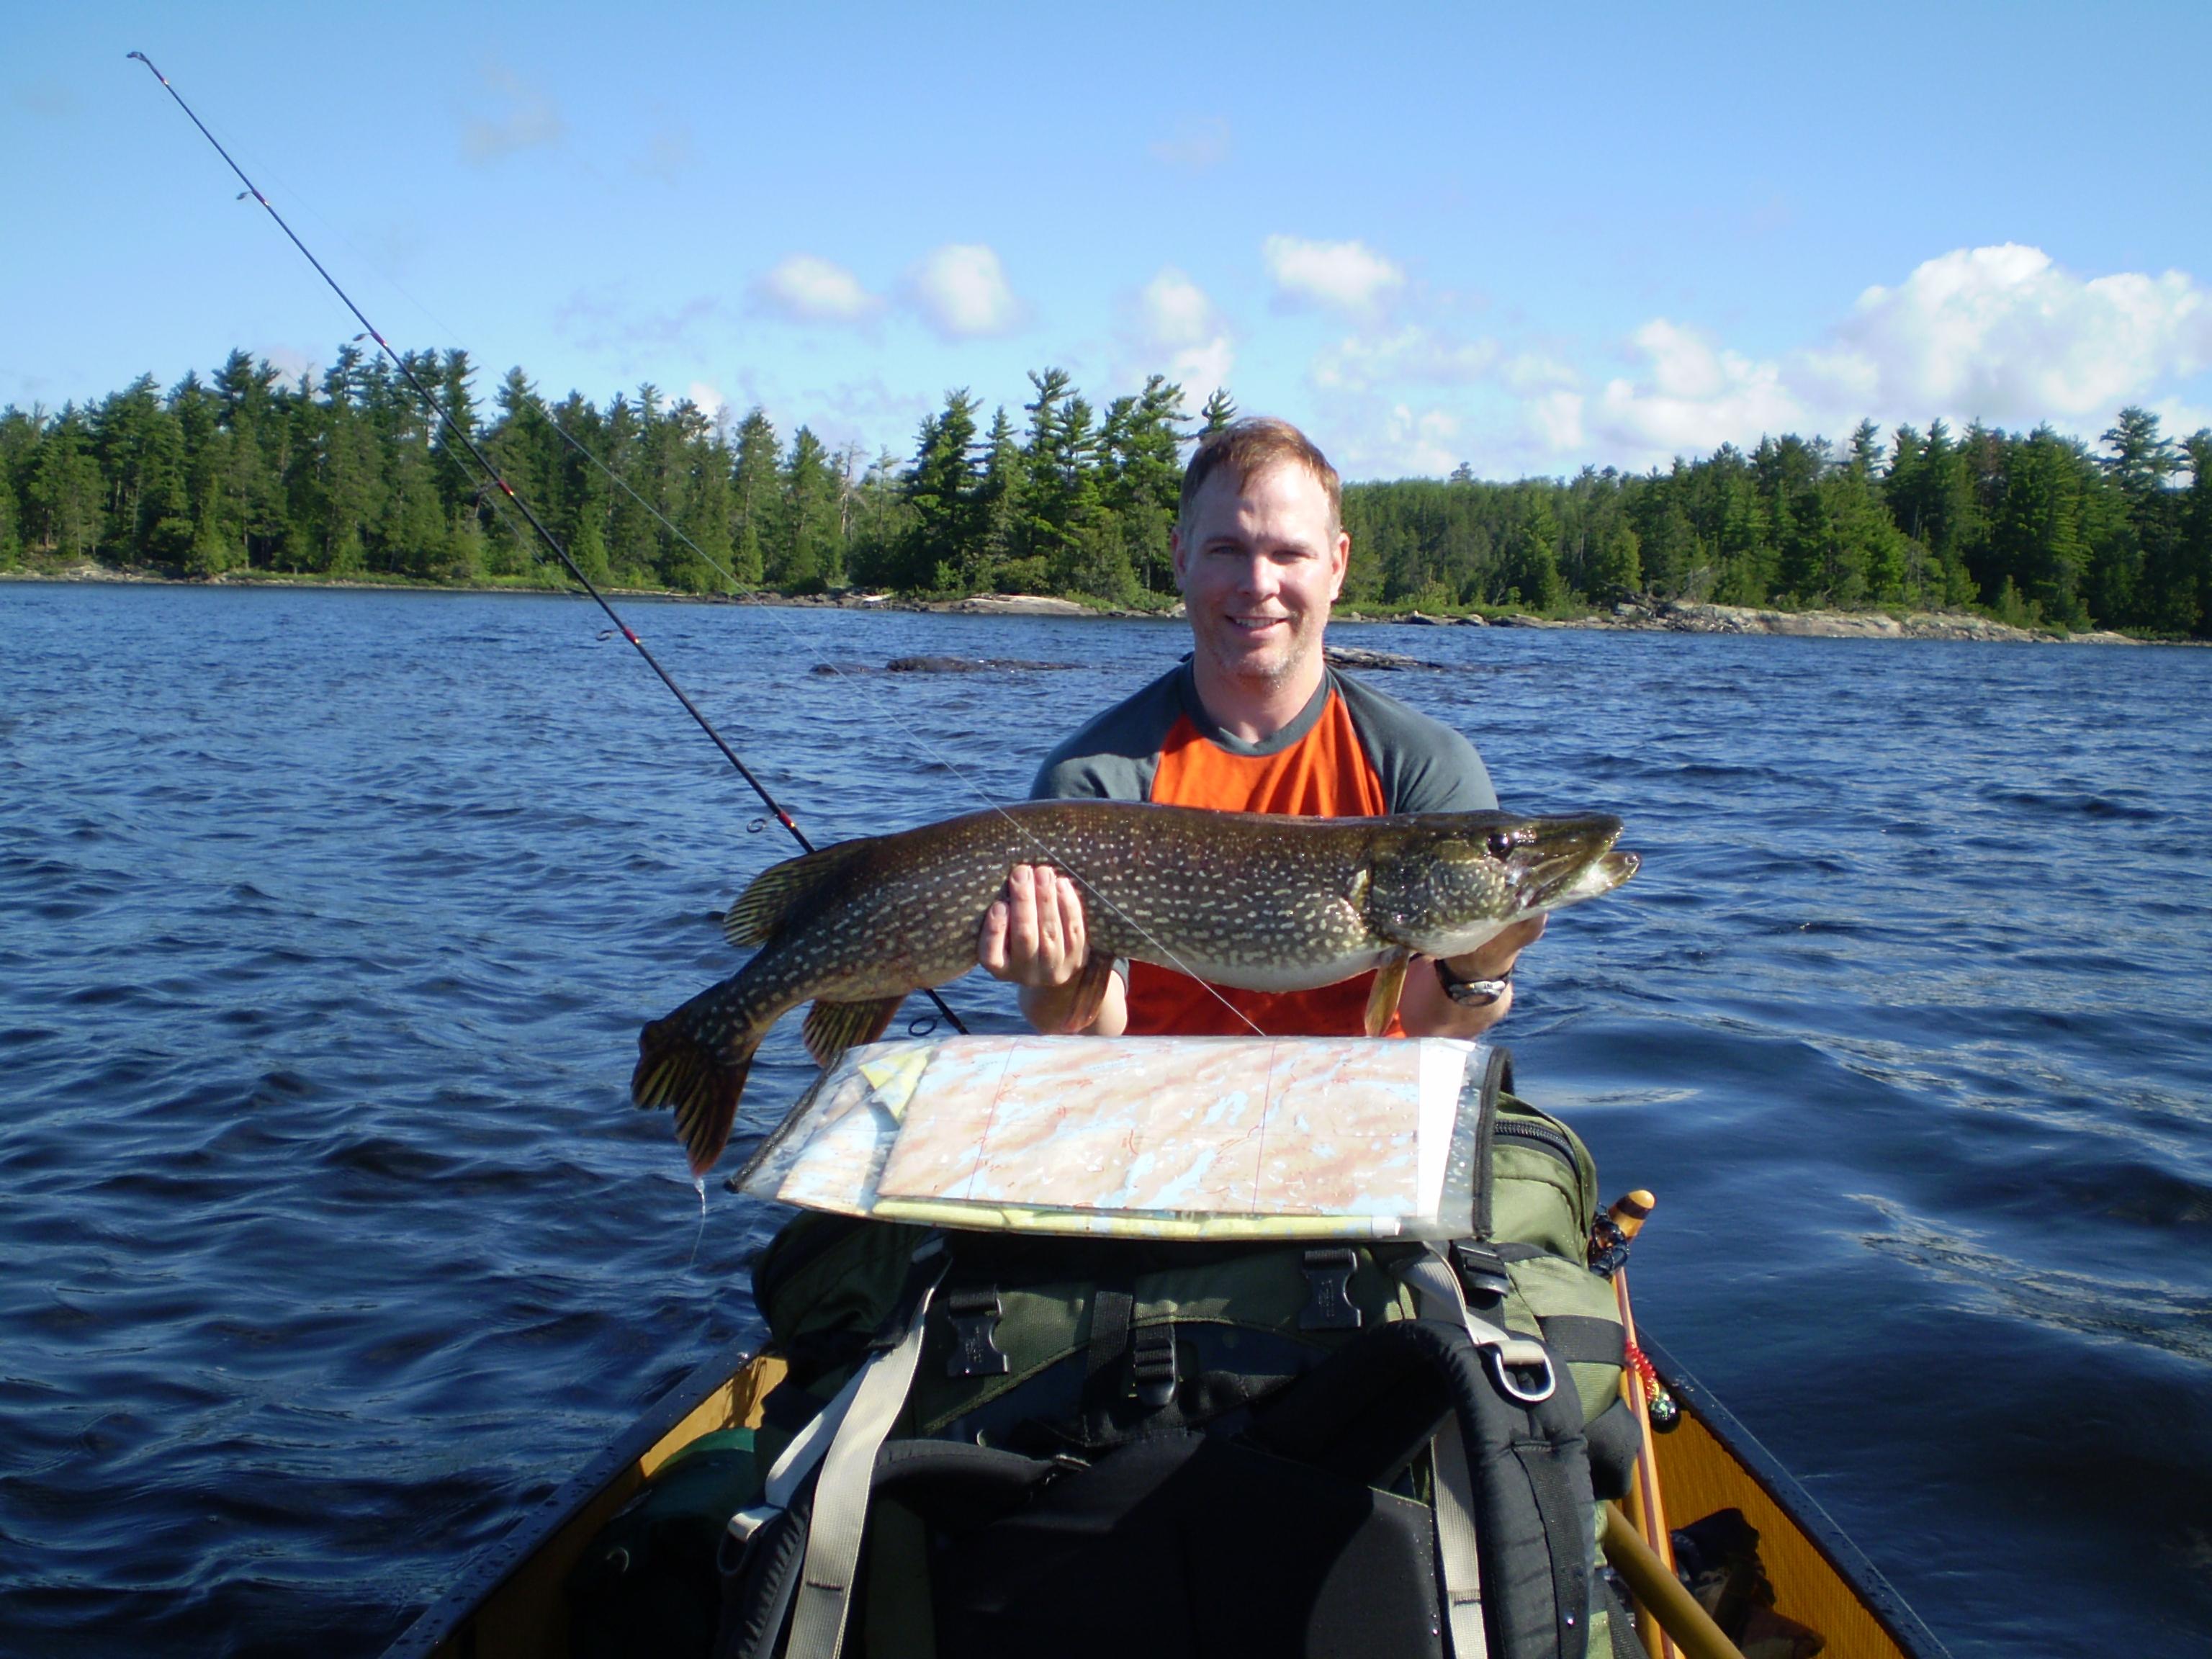 Bwca want big pike boundary waters fishing forum for Boundary waters fishing